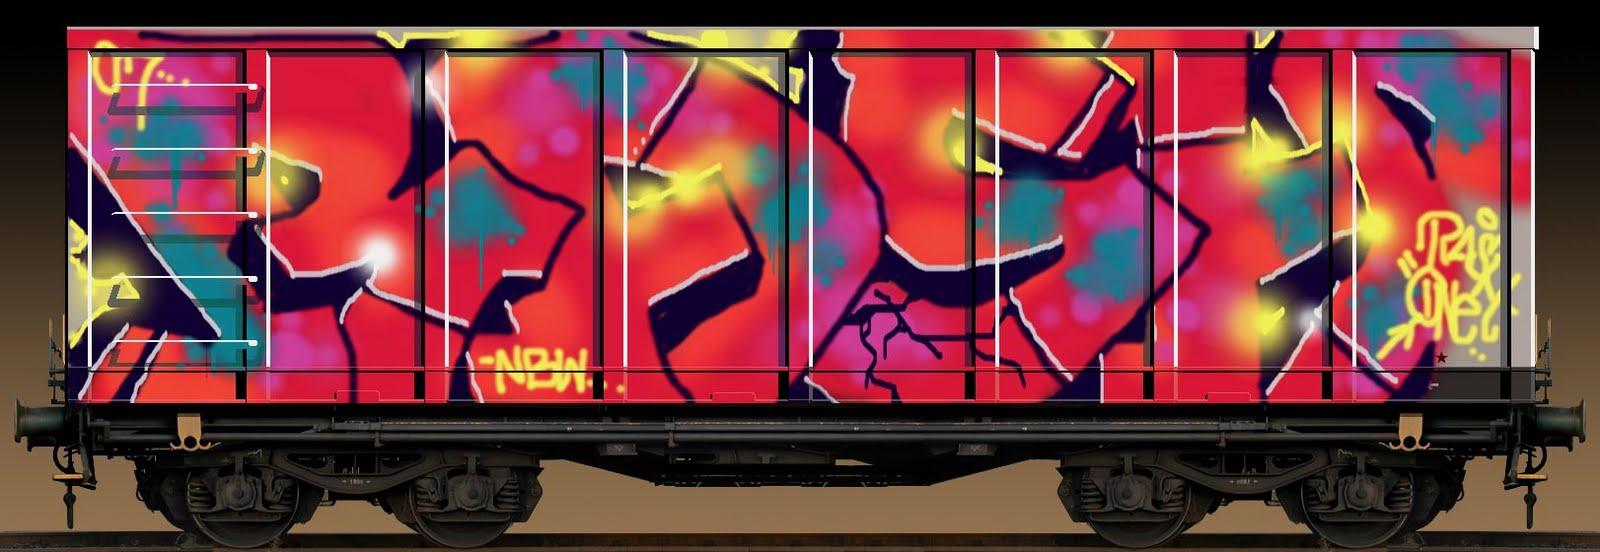 lrpd graffiti